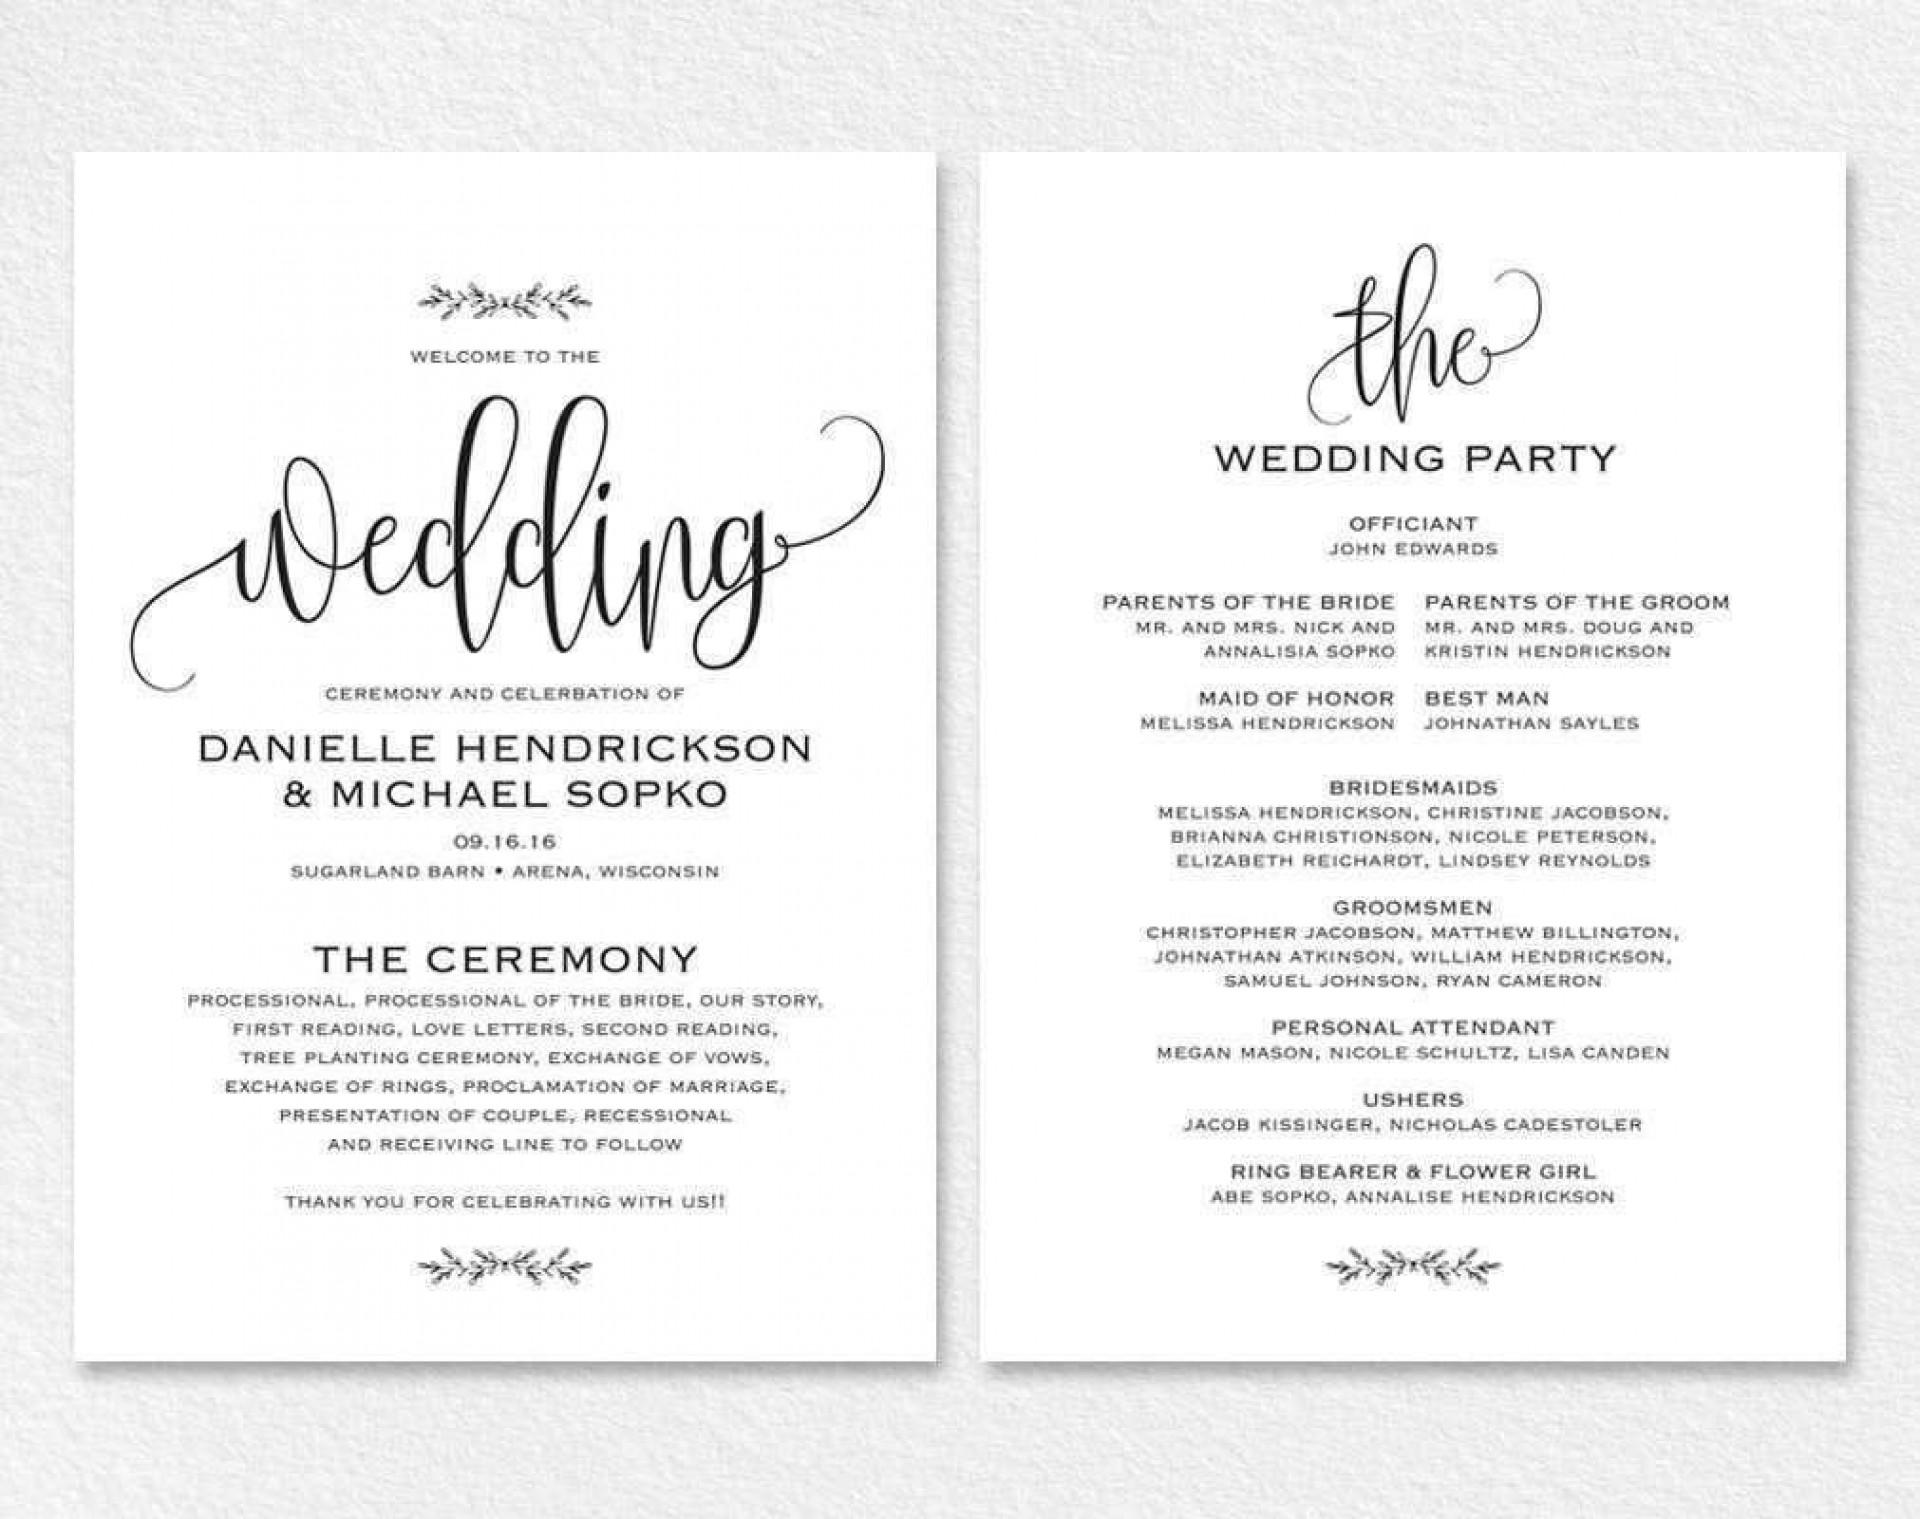 002 Frightening Microsoft Office Wedding Invitation Template Design  Templates M1920